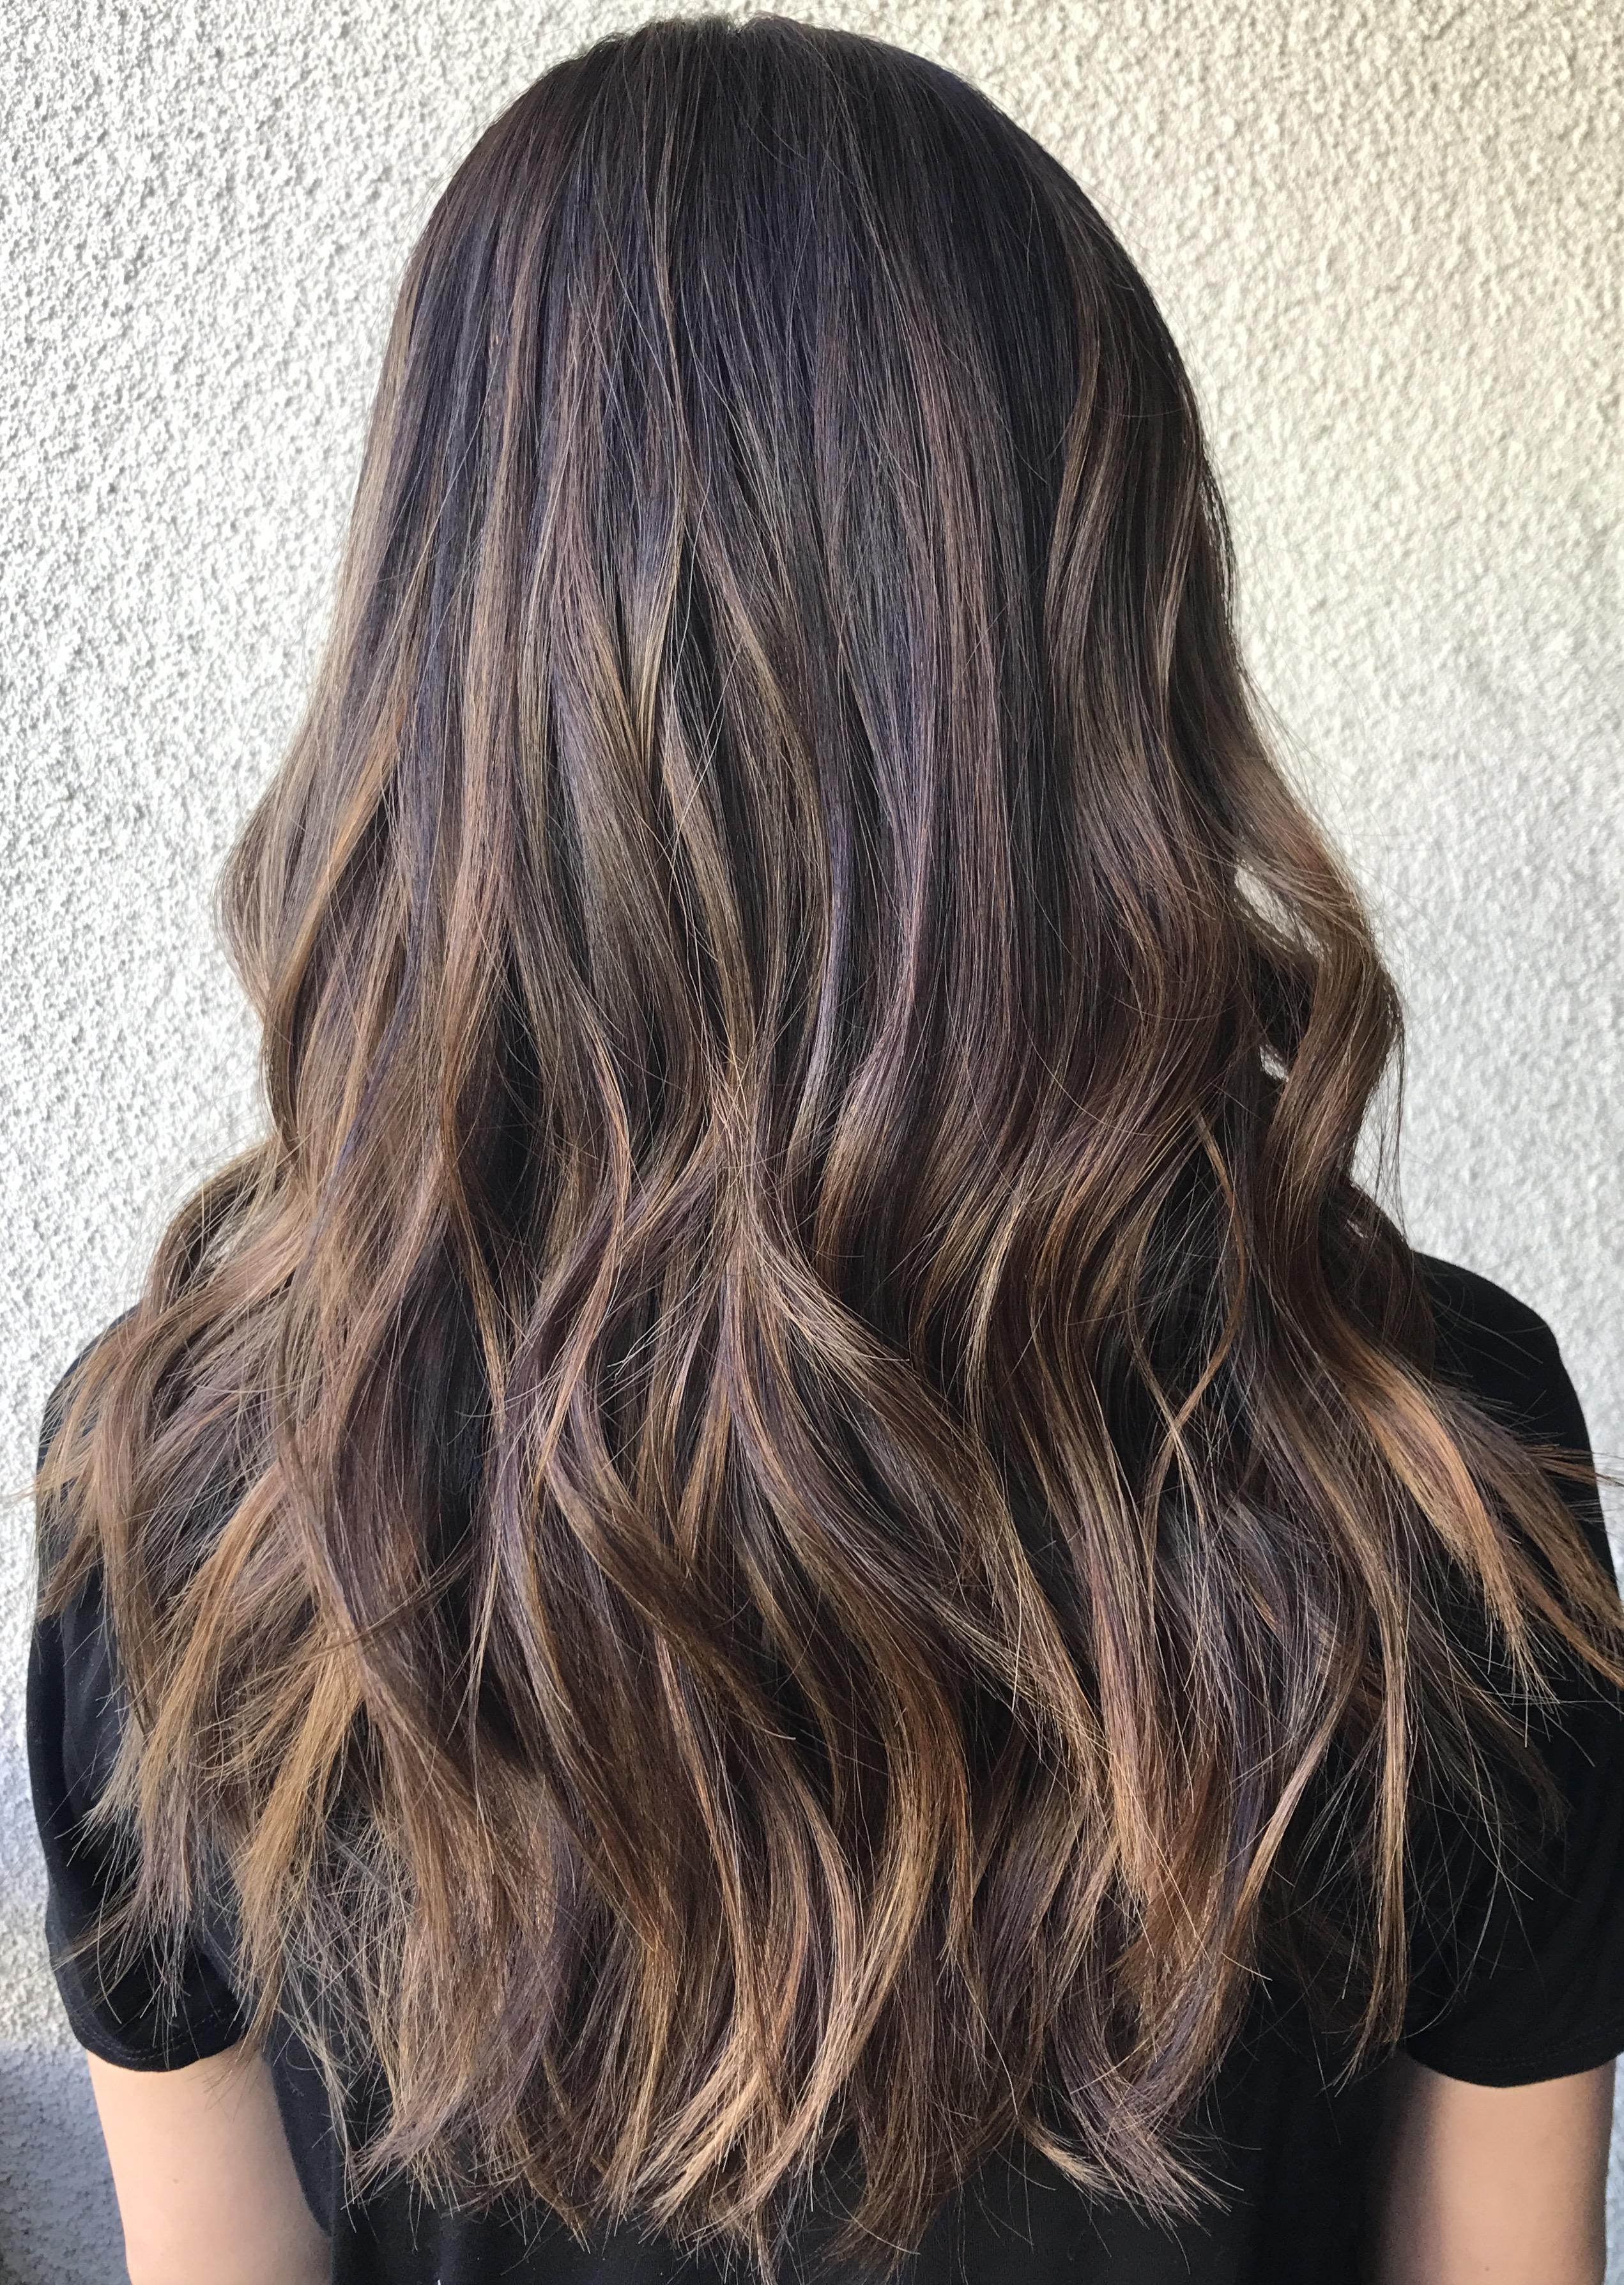 chestnut balayage hair color